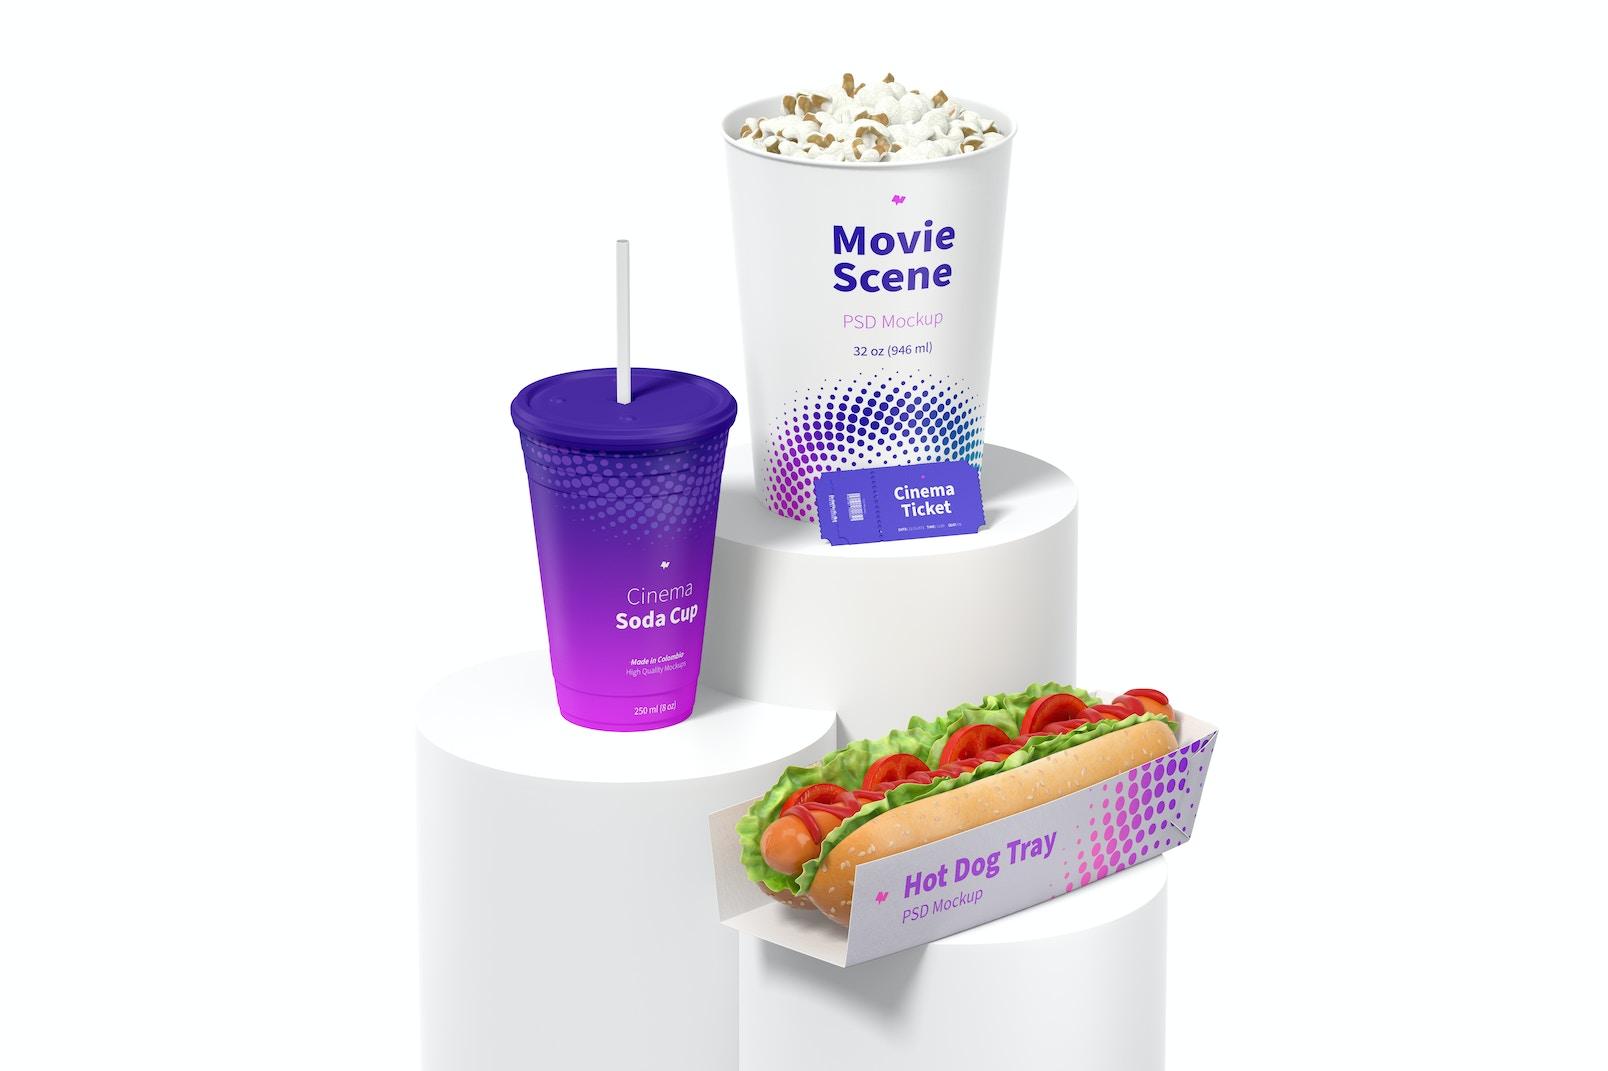 Movie Scene Mockup, Right View